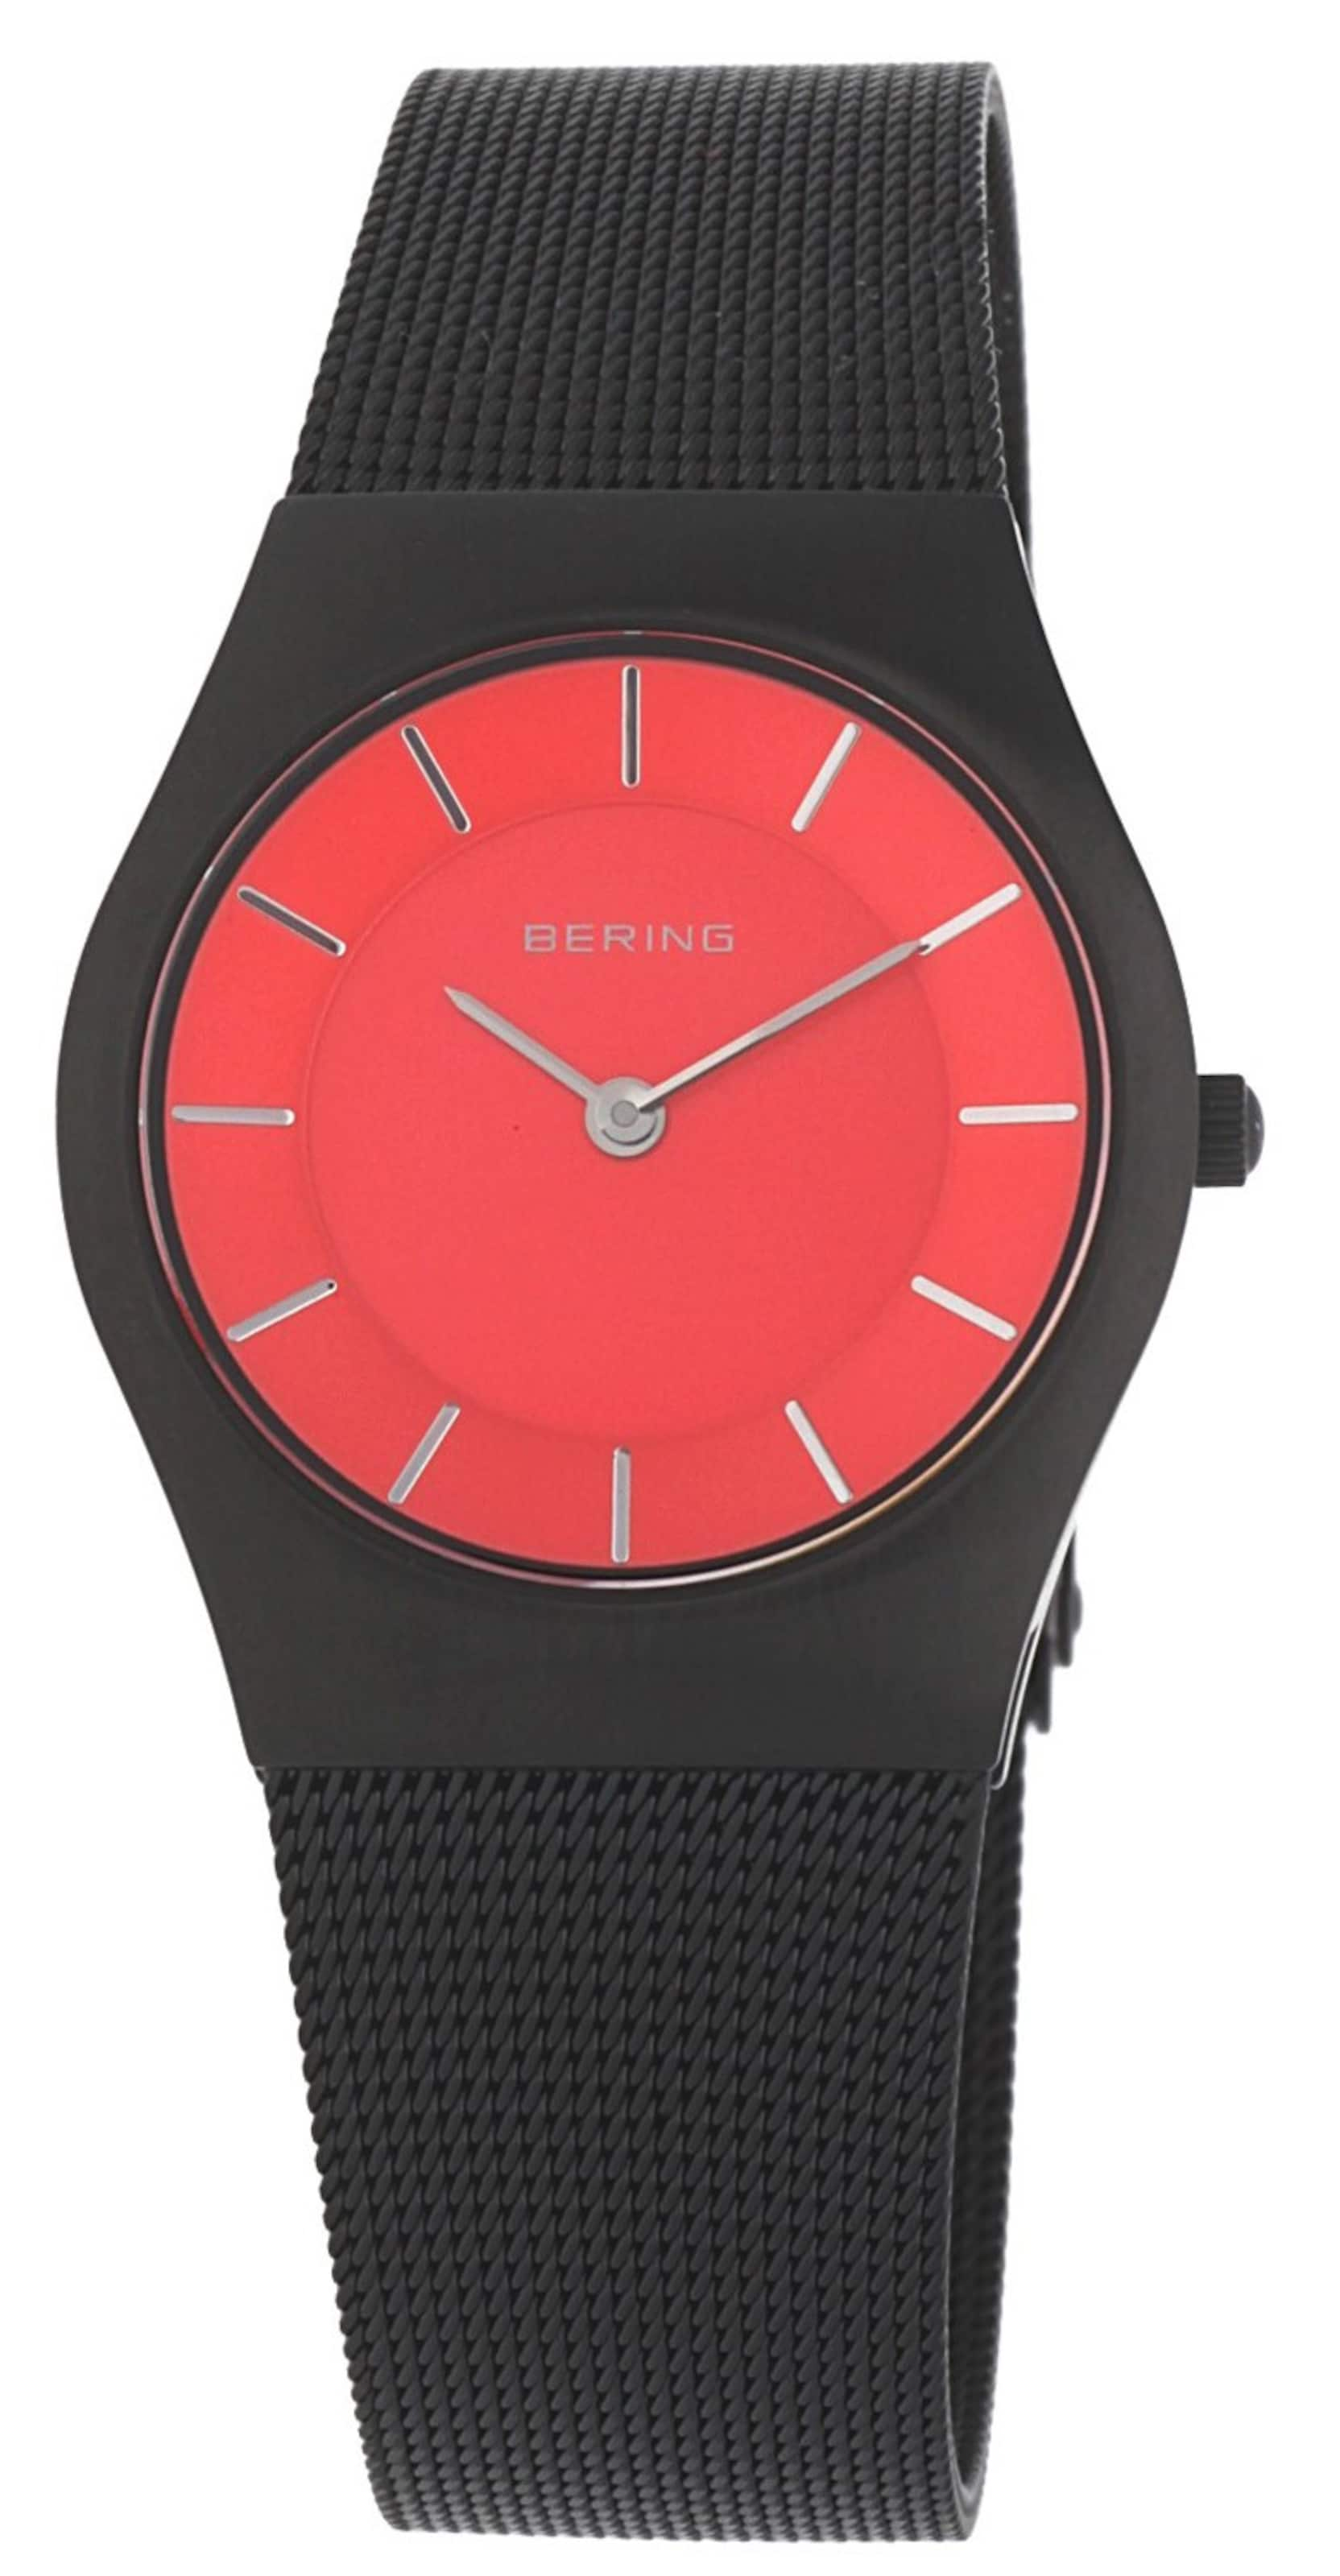 BERING Armbanduhr 11930-229 Freies Verschiffen NXPRSe00c